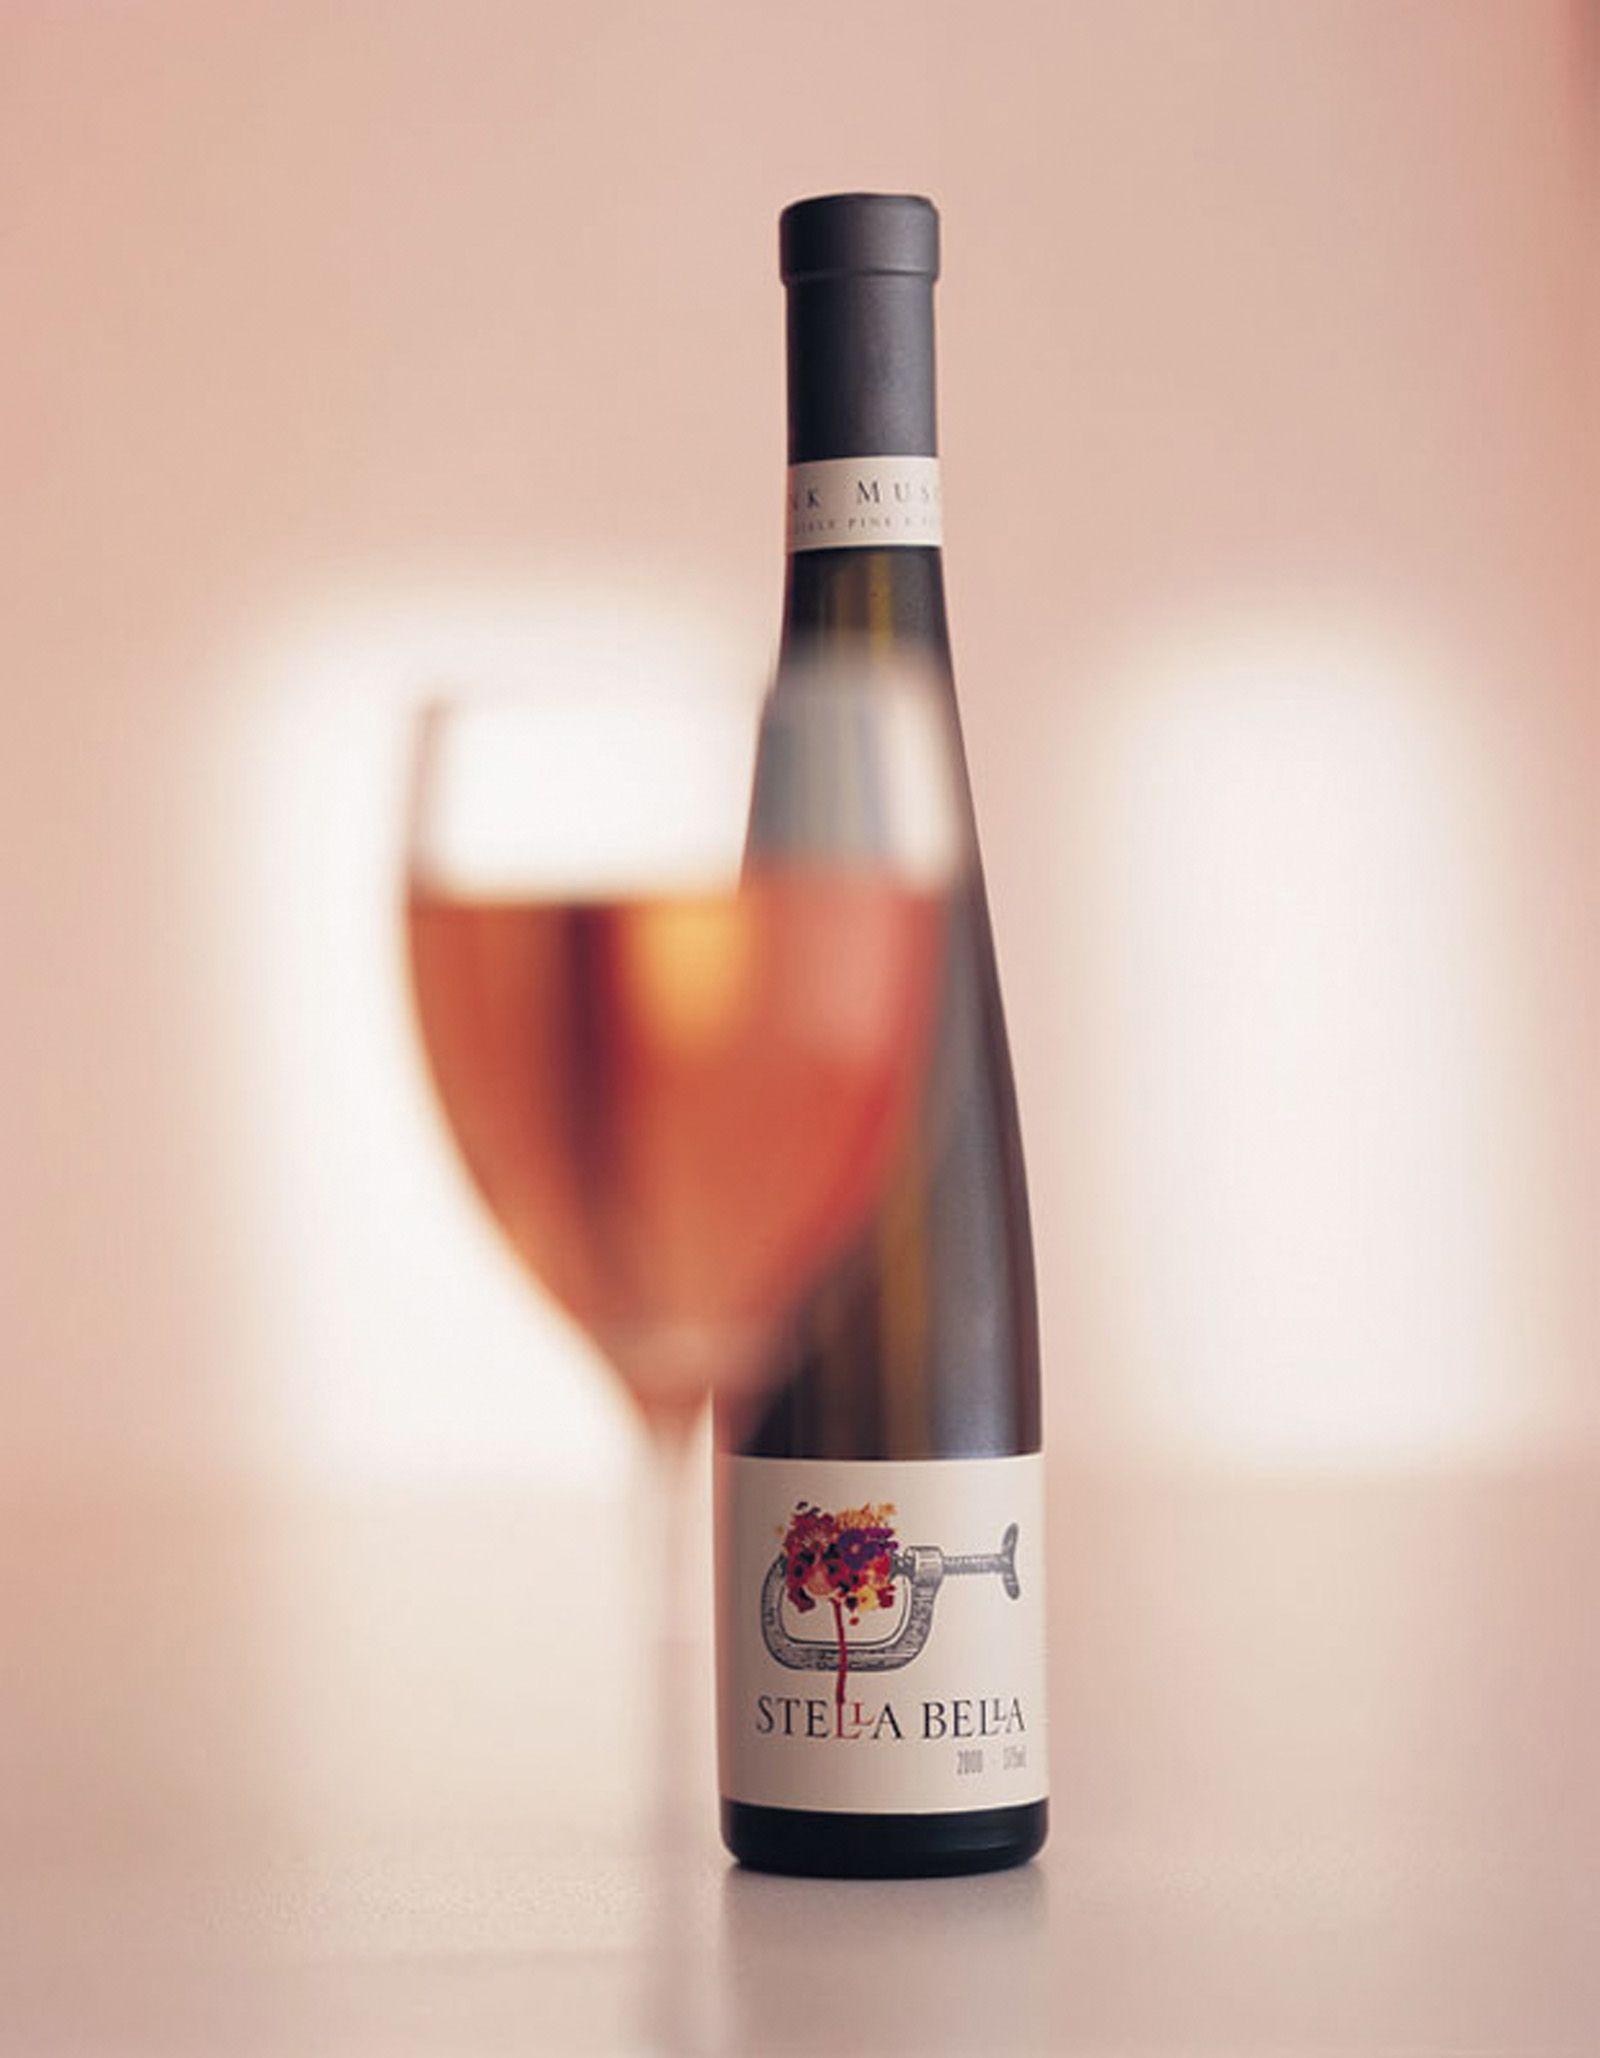 Stella Bella Wine Bottle Shot By Acorn Photo Wine Bottle Photography Wine Bottle Bottle